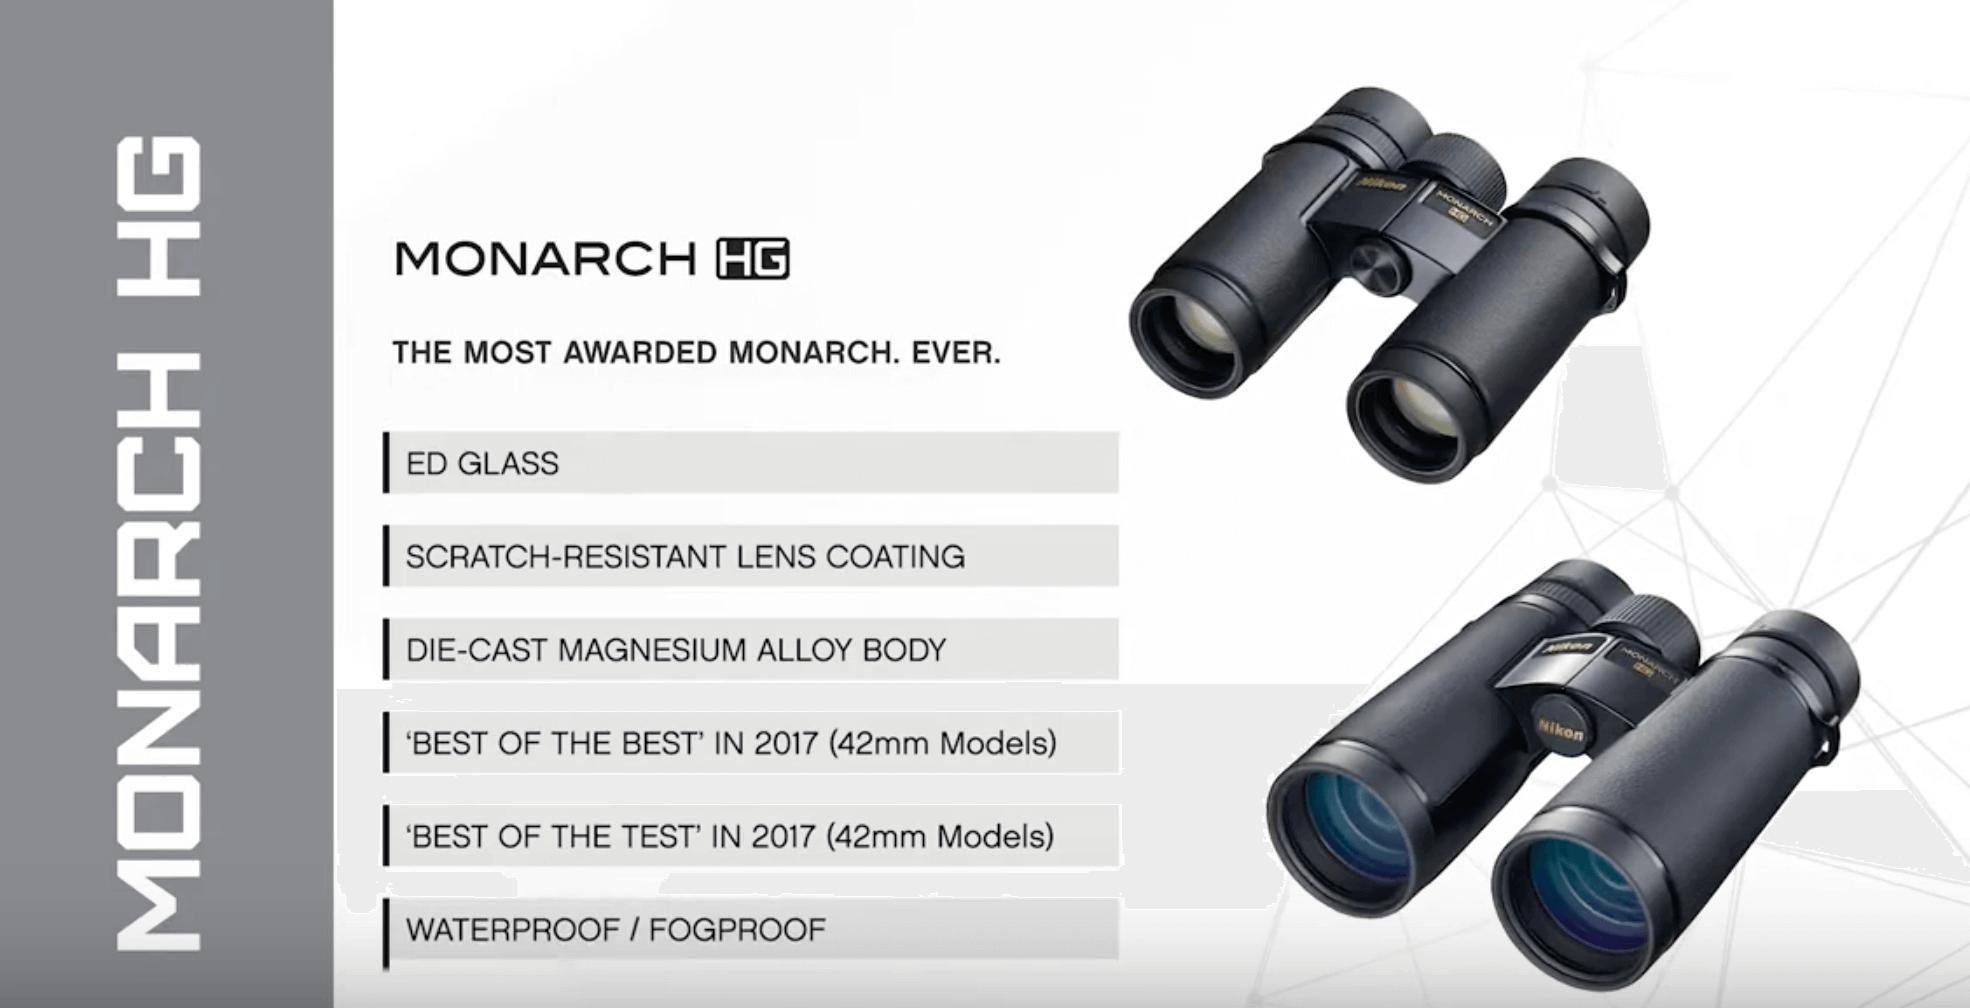 monarch-HG-binoculars